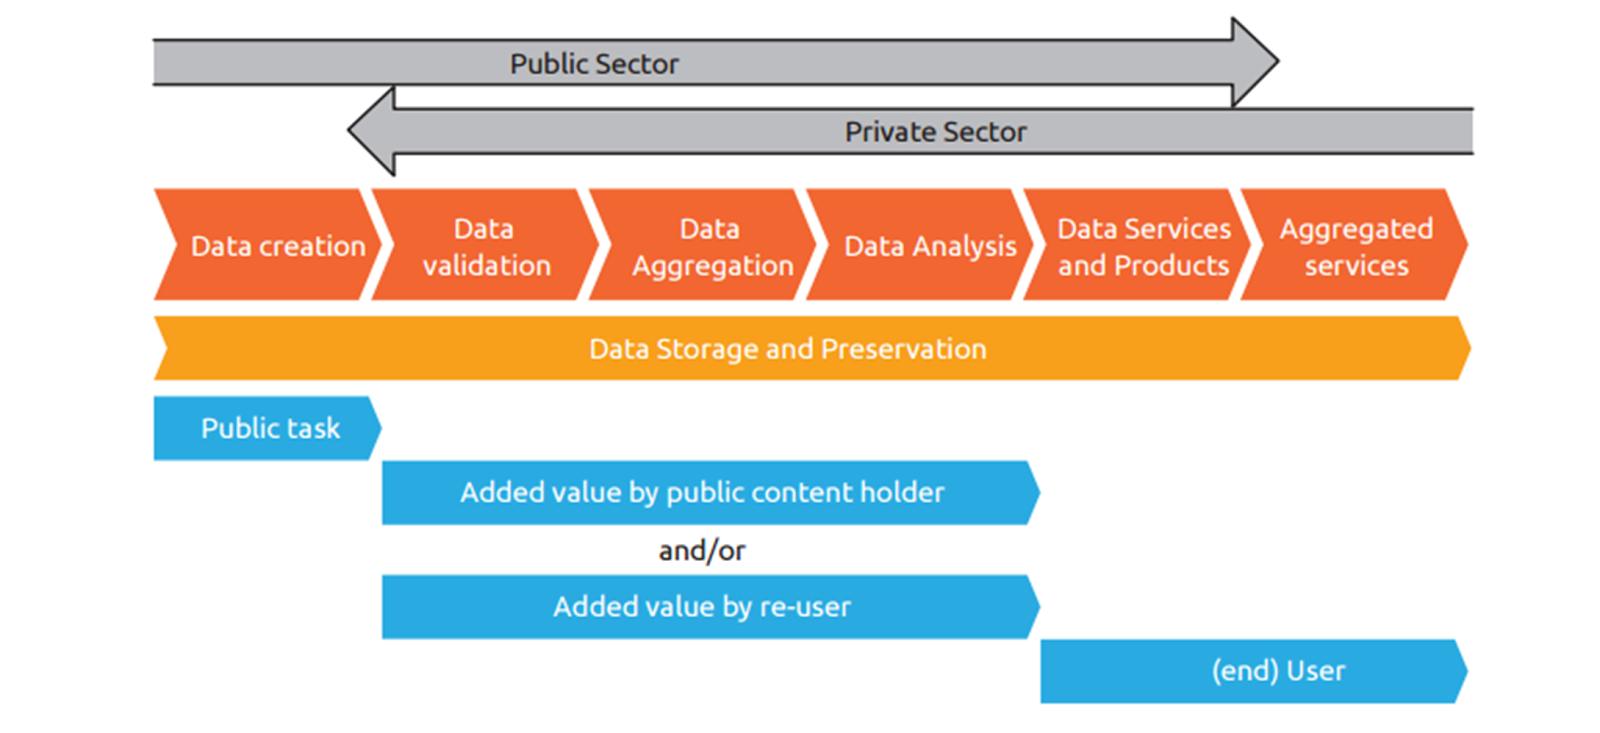 Source: Open Data Value Chain European Data Portal Report